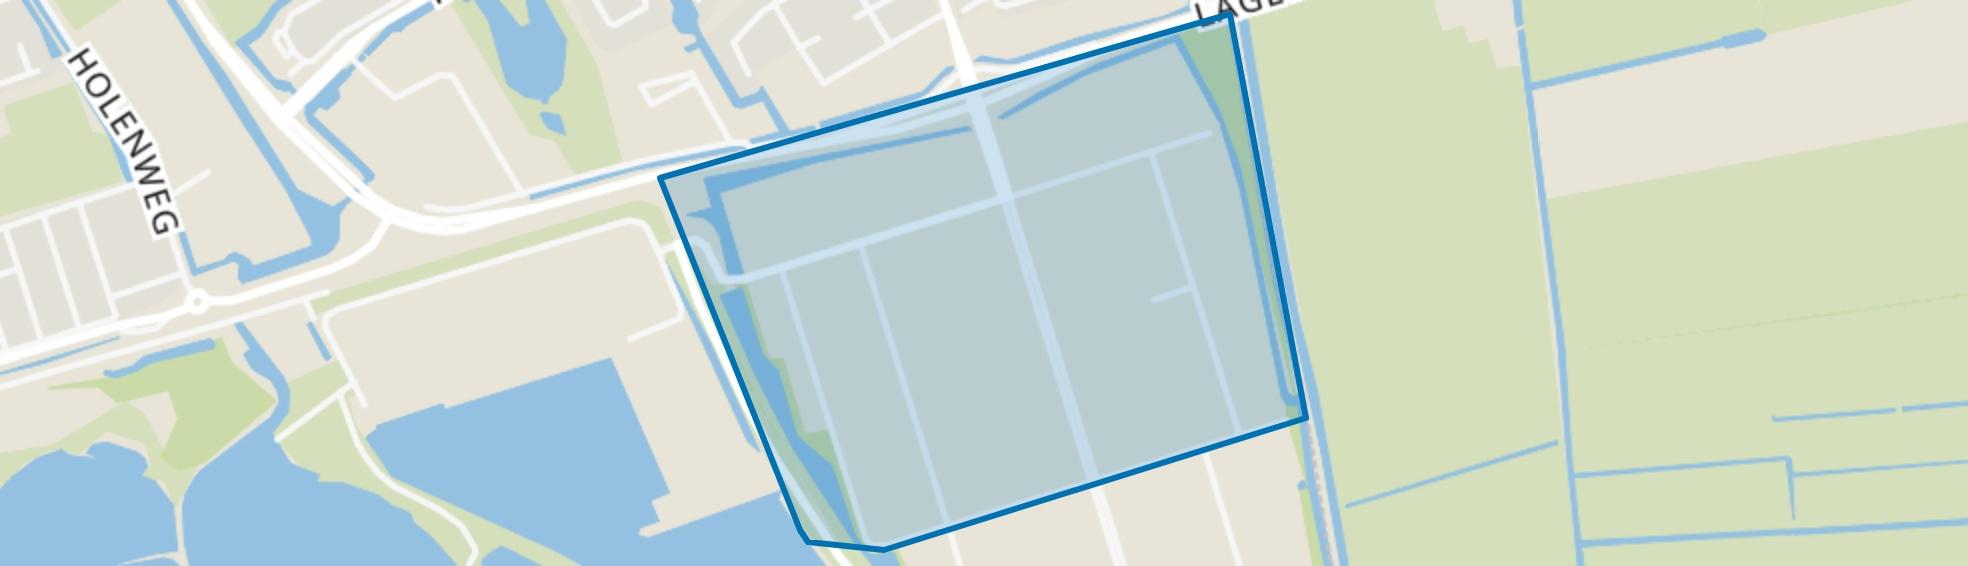 Hoorn 80 - Buurt 34 01, Hoorn (NH) map